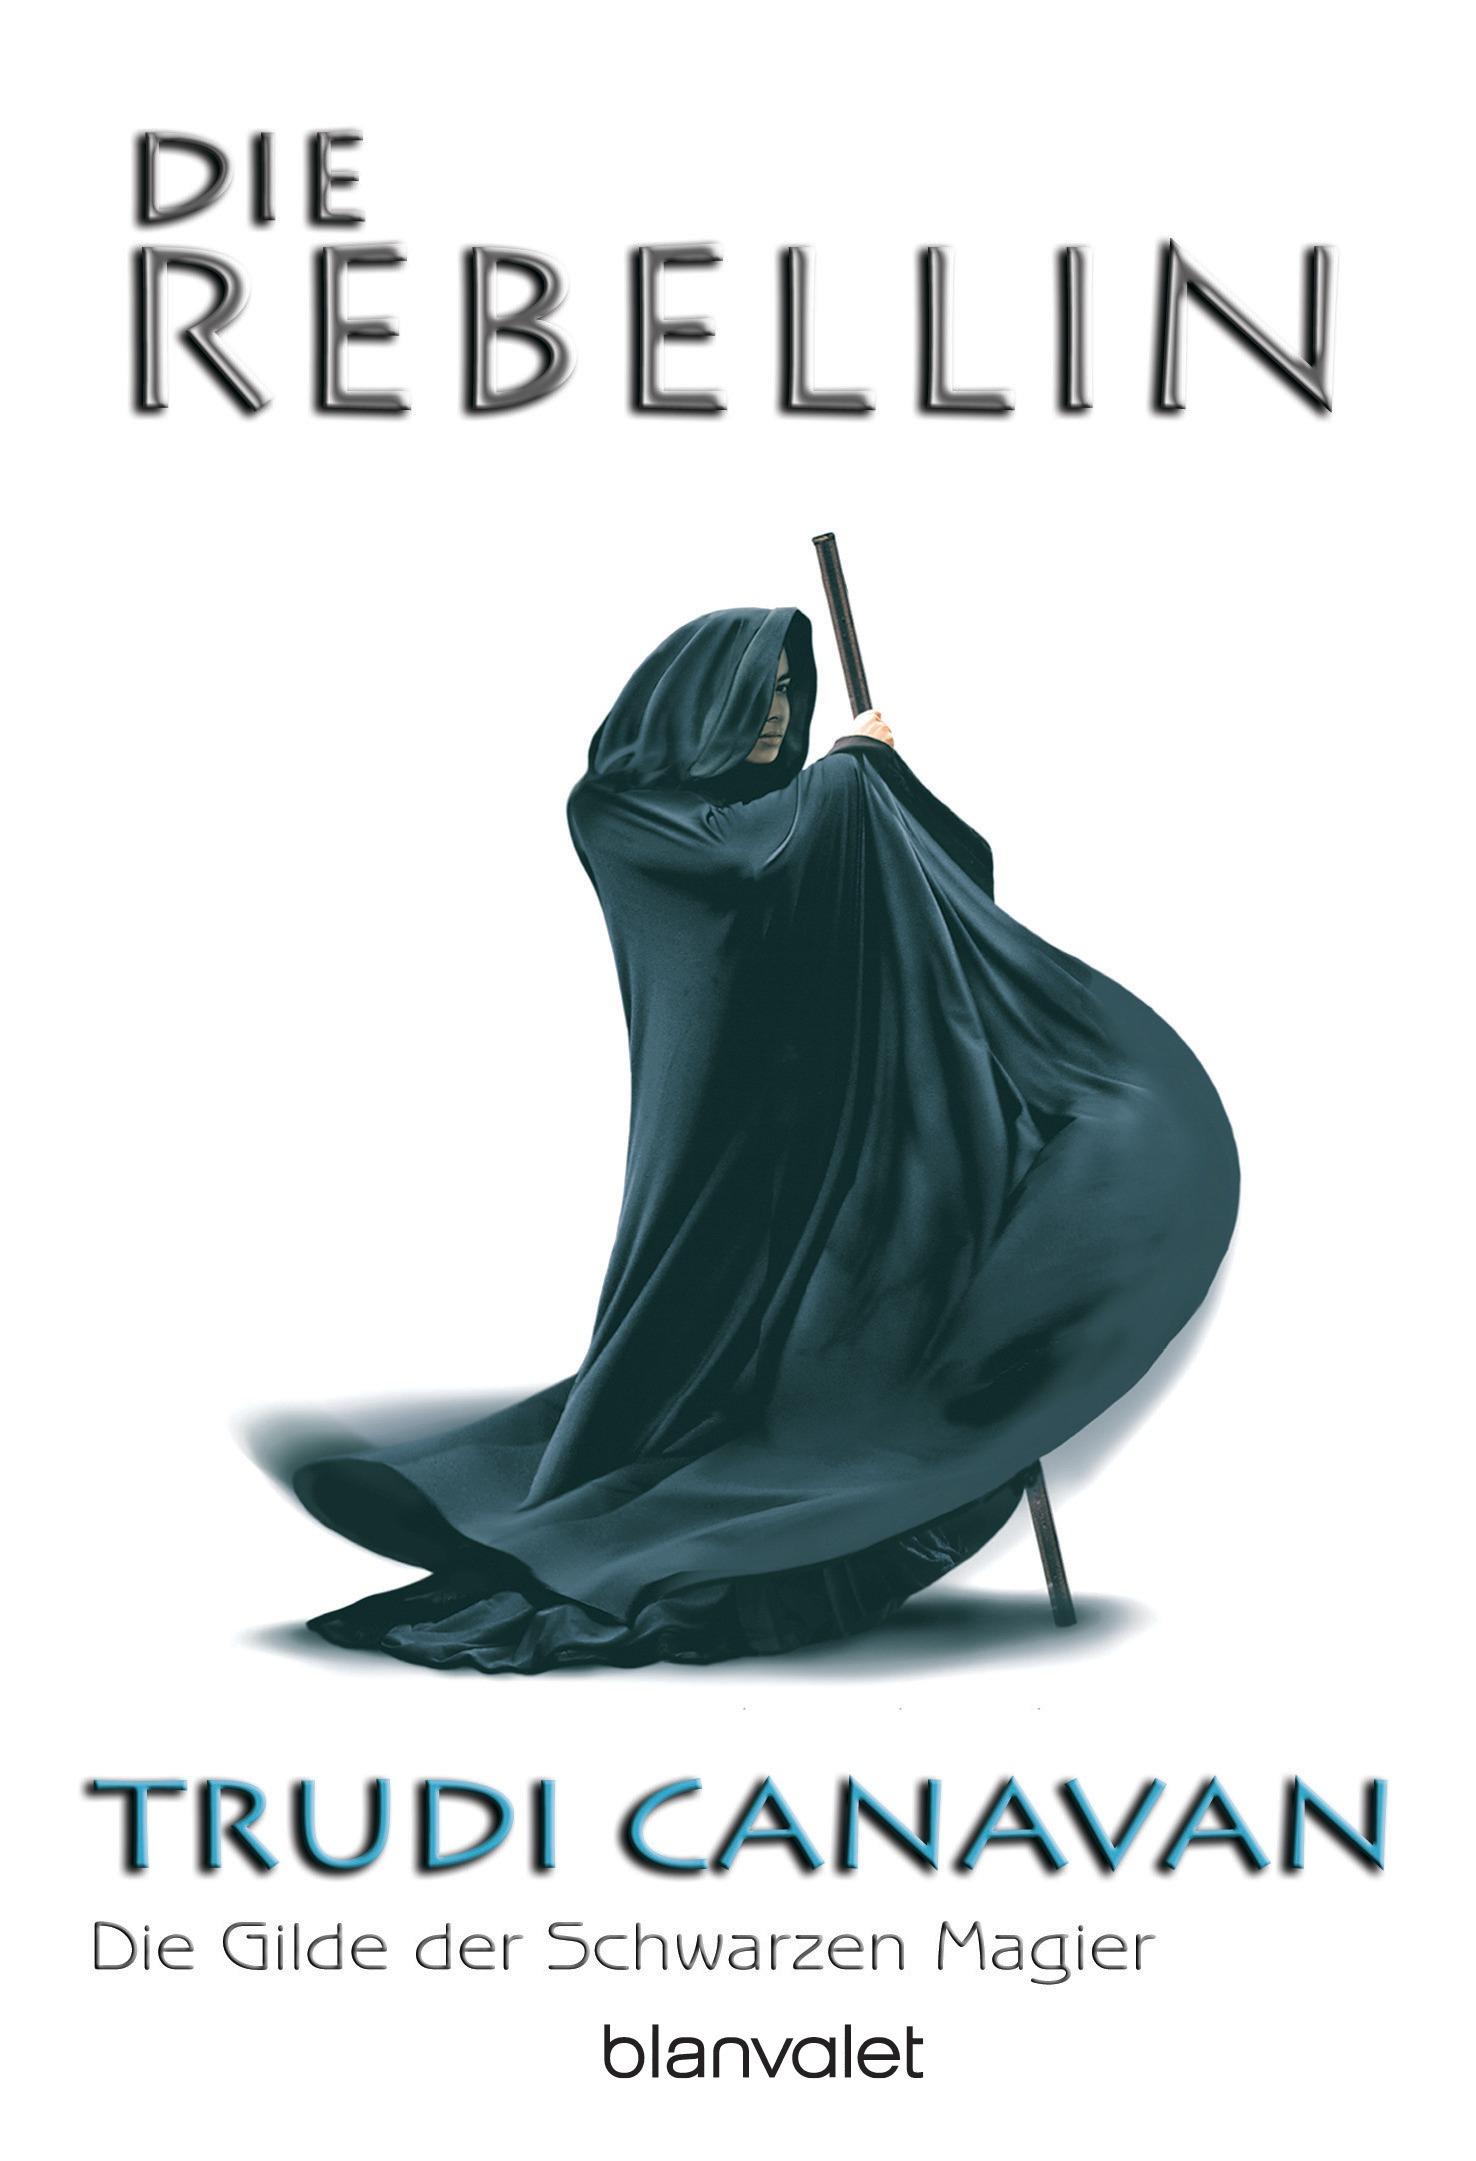 Die Rebellin. Die Gilde der Schwarzen Magier 01. - Trudi Canavan